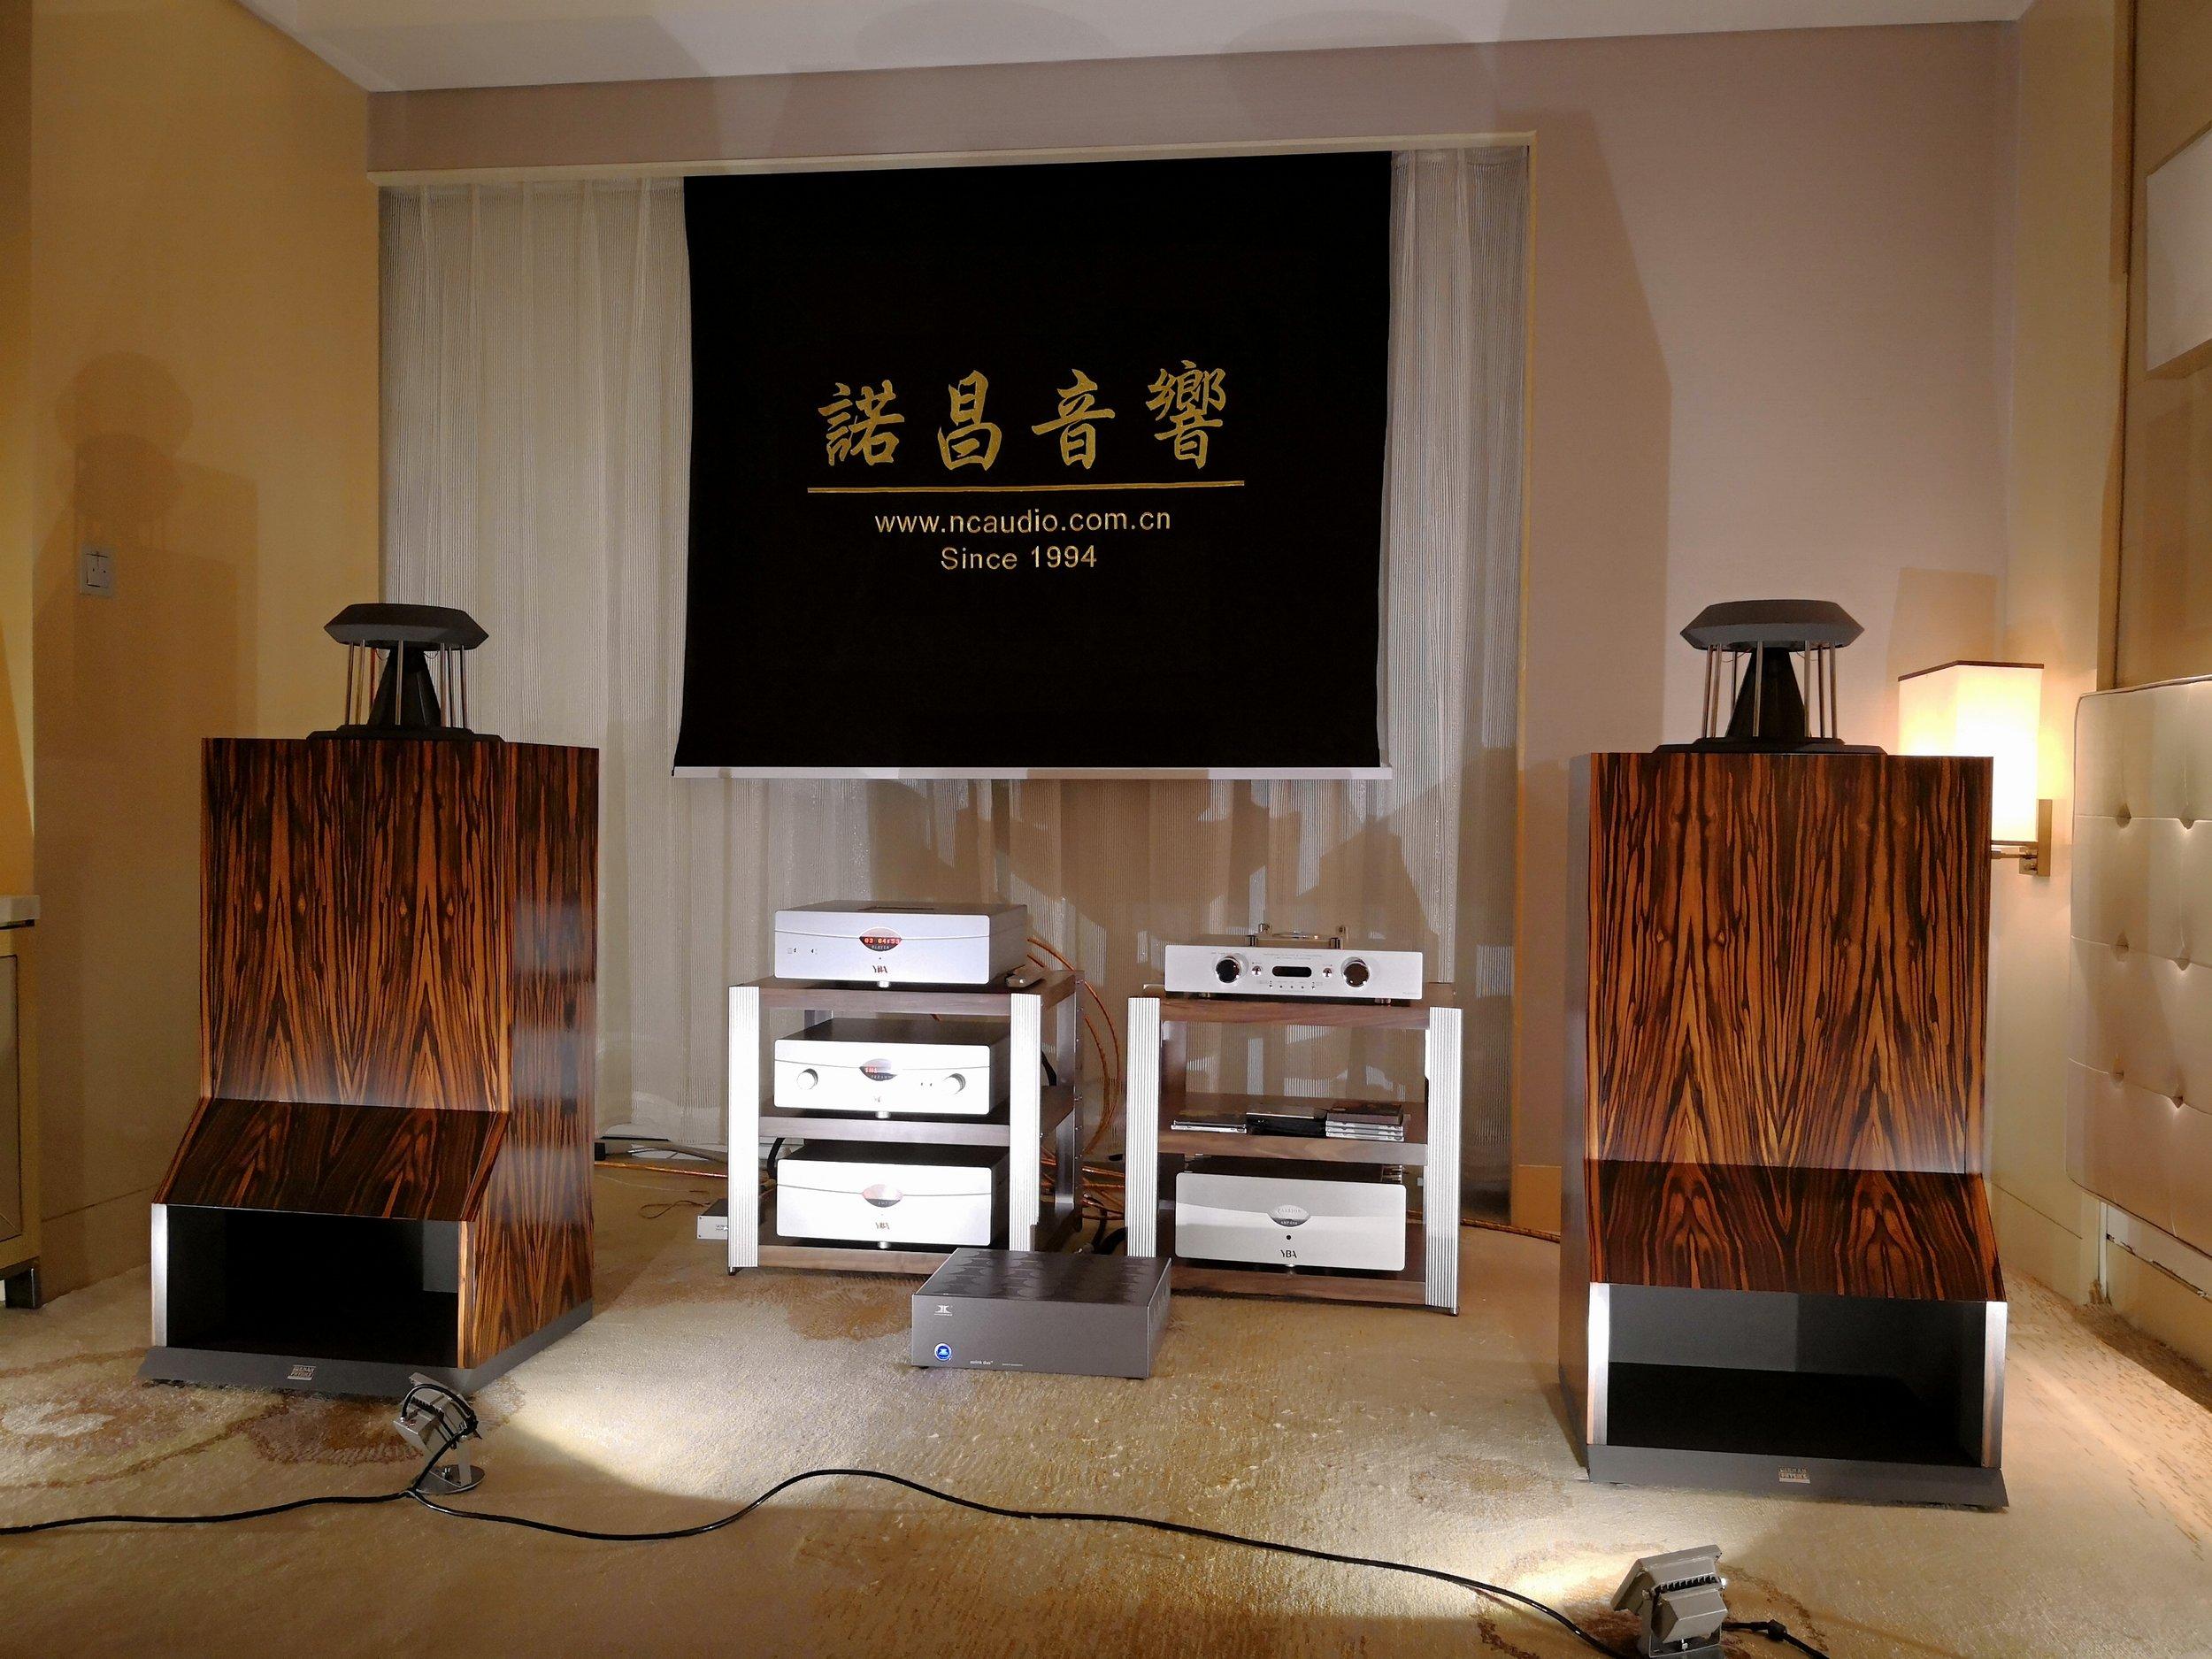 Unicorn Mk II loudspeakers in macassar | Dalian 2018 Show, China